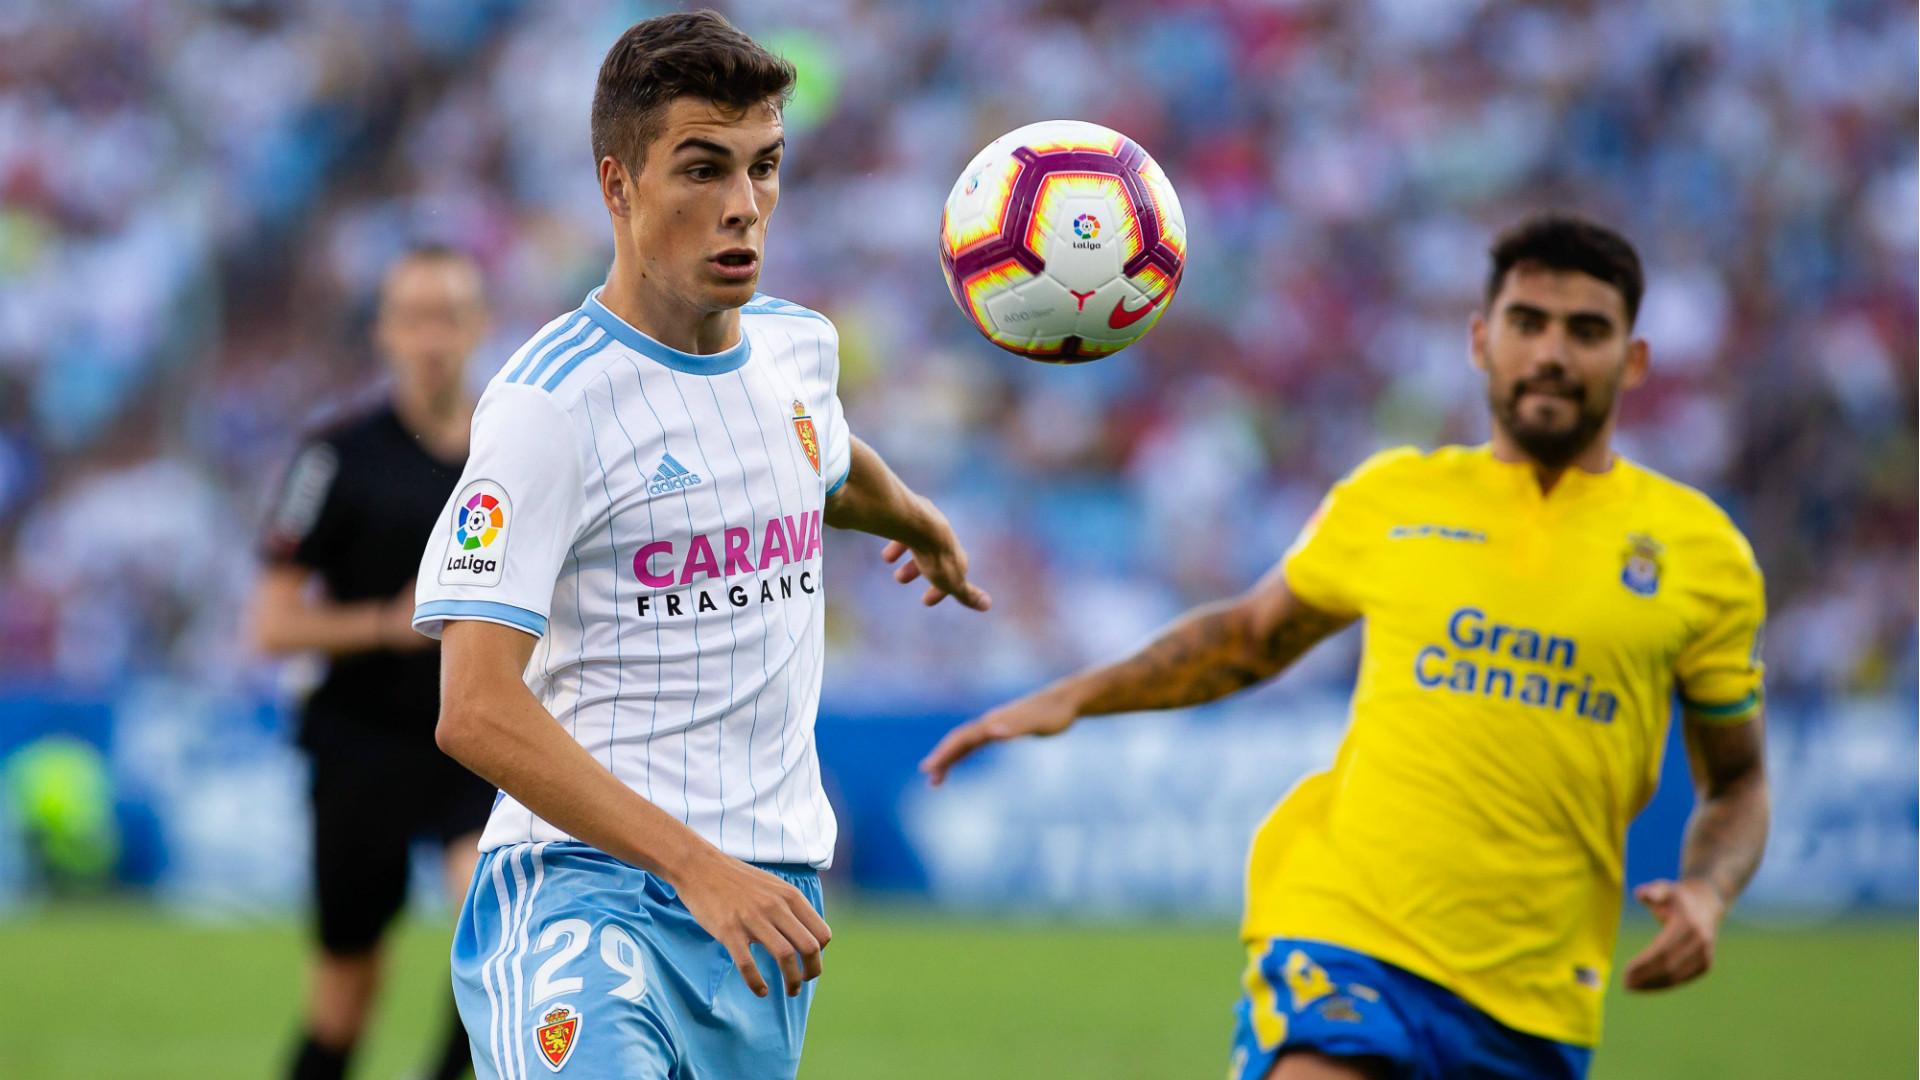 Officiel - Mercato : la pépite Alberto Soro rejoindra le Real Madrid à l'été 2020